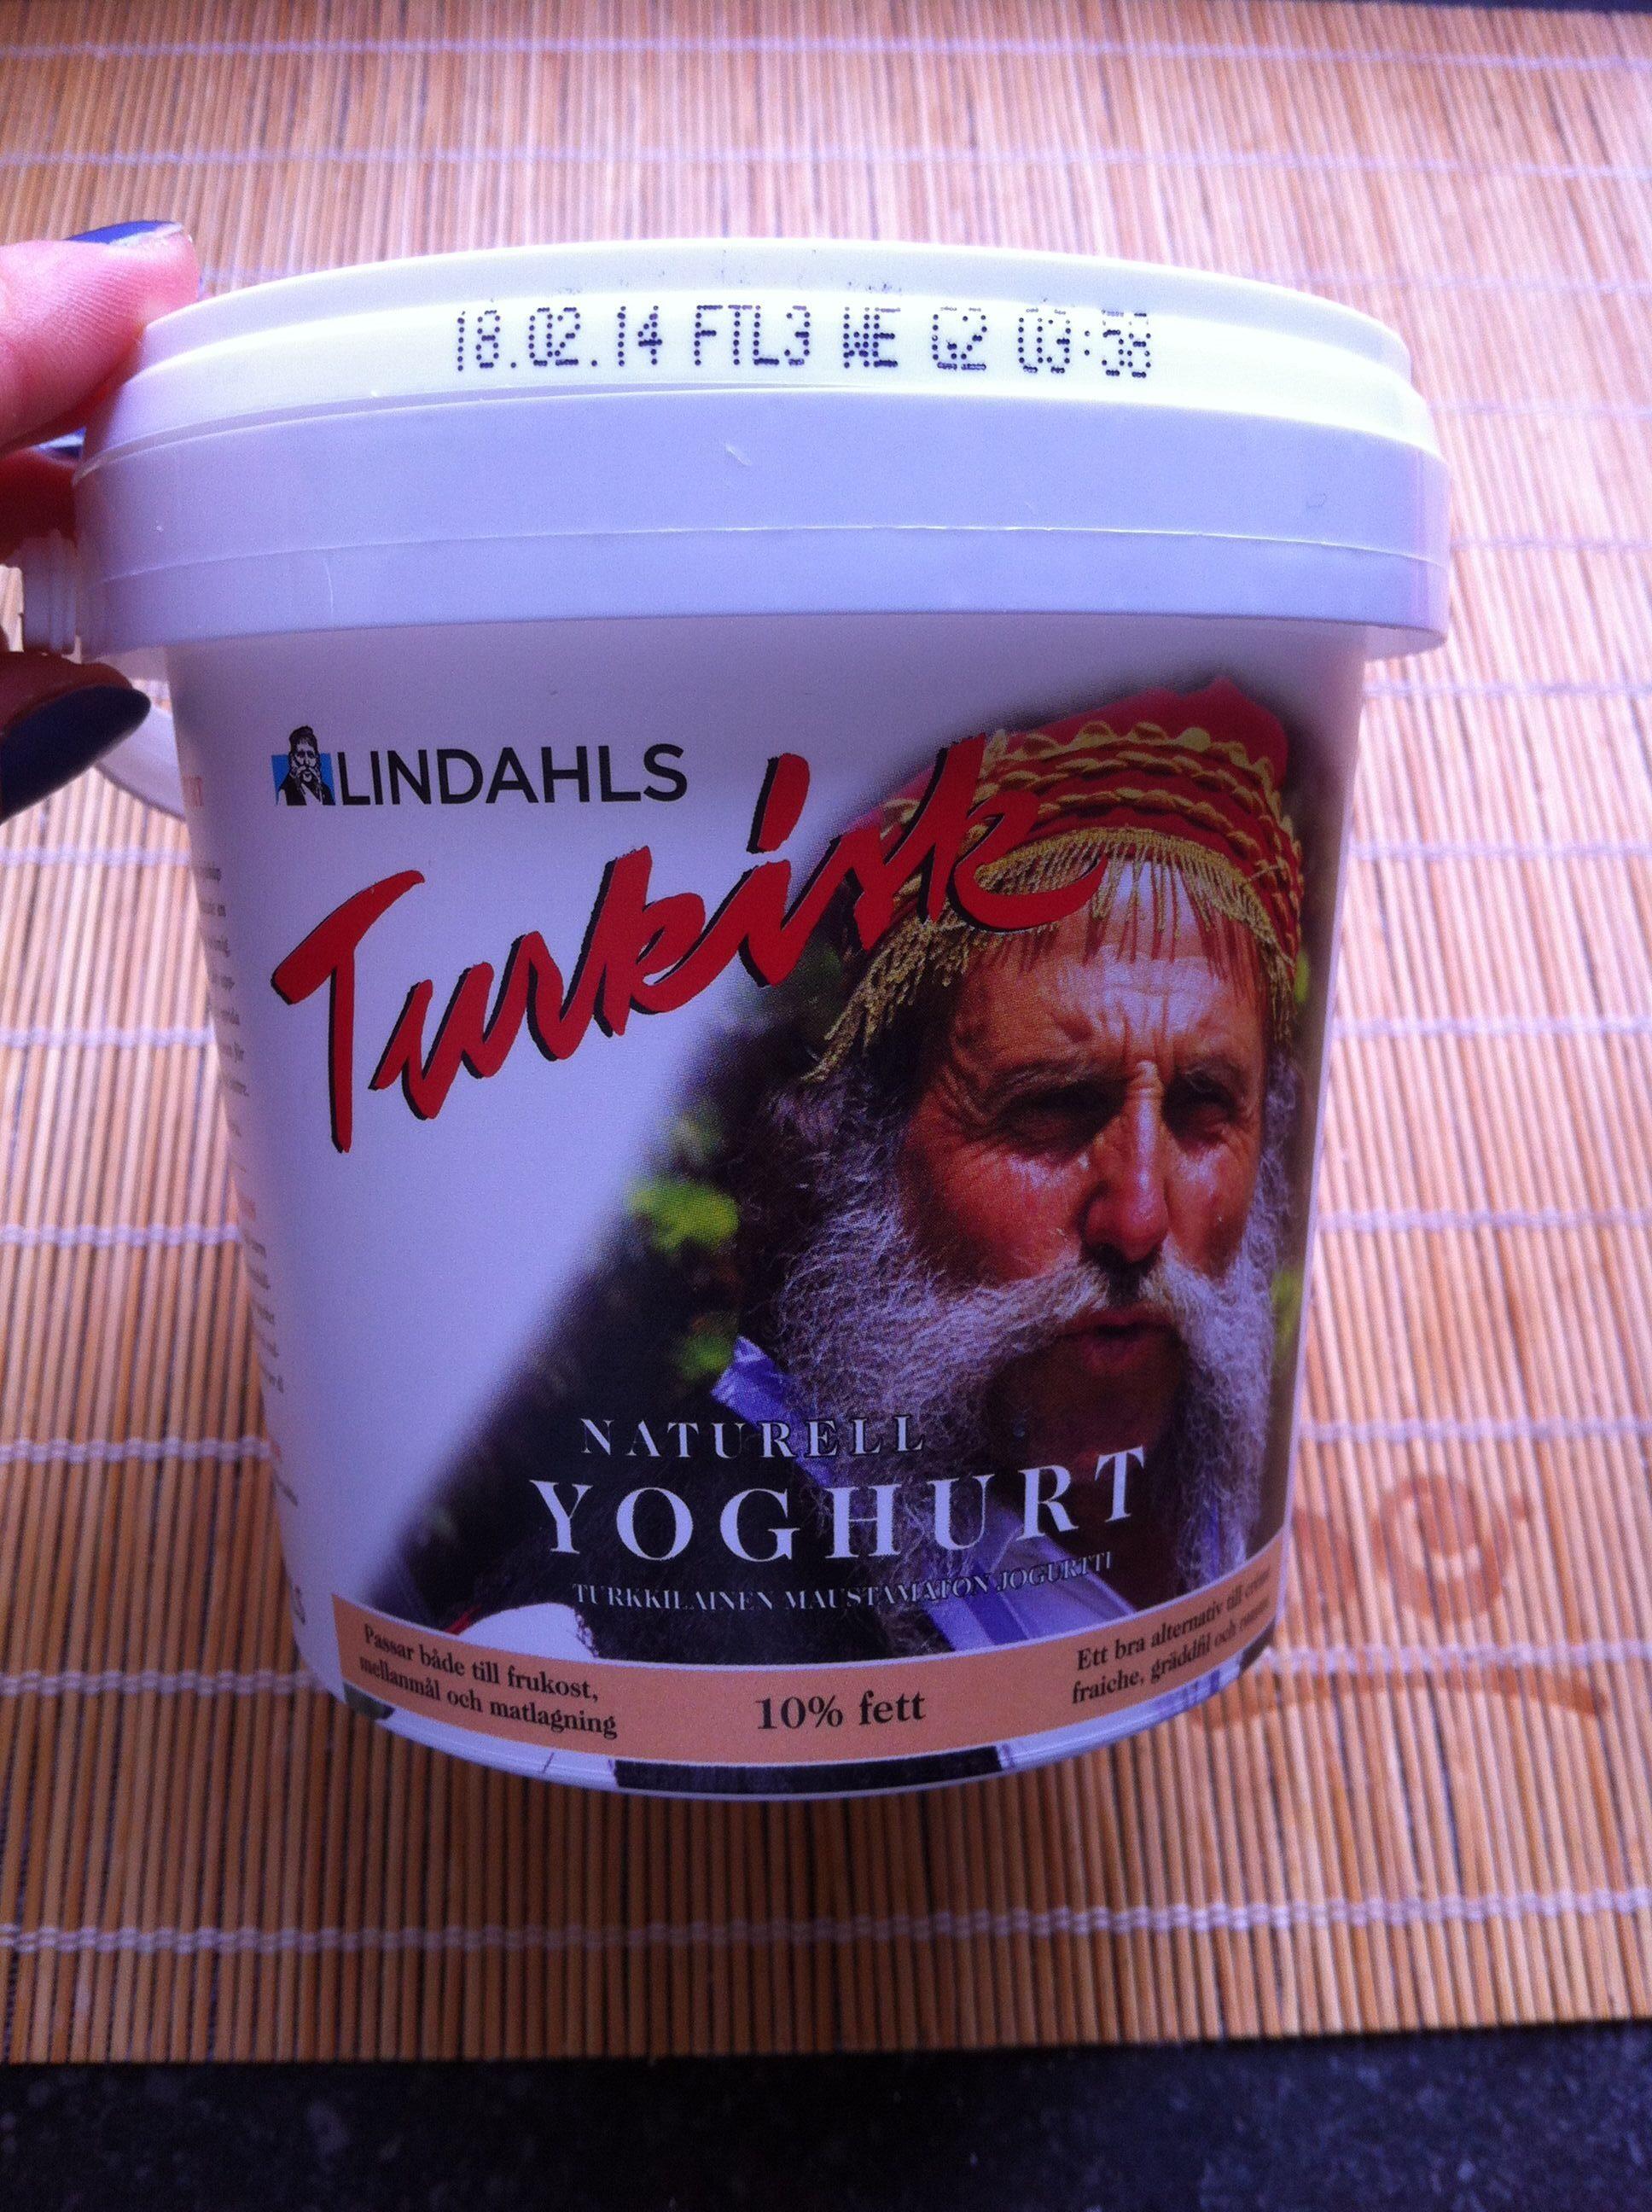 Naturell Yoghurt 10% fett - Produit - sv